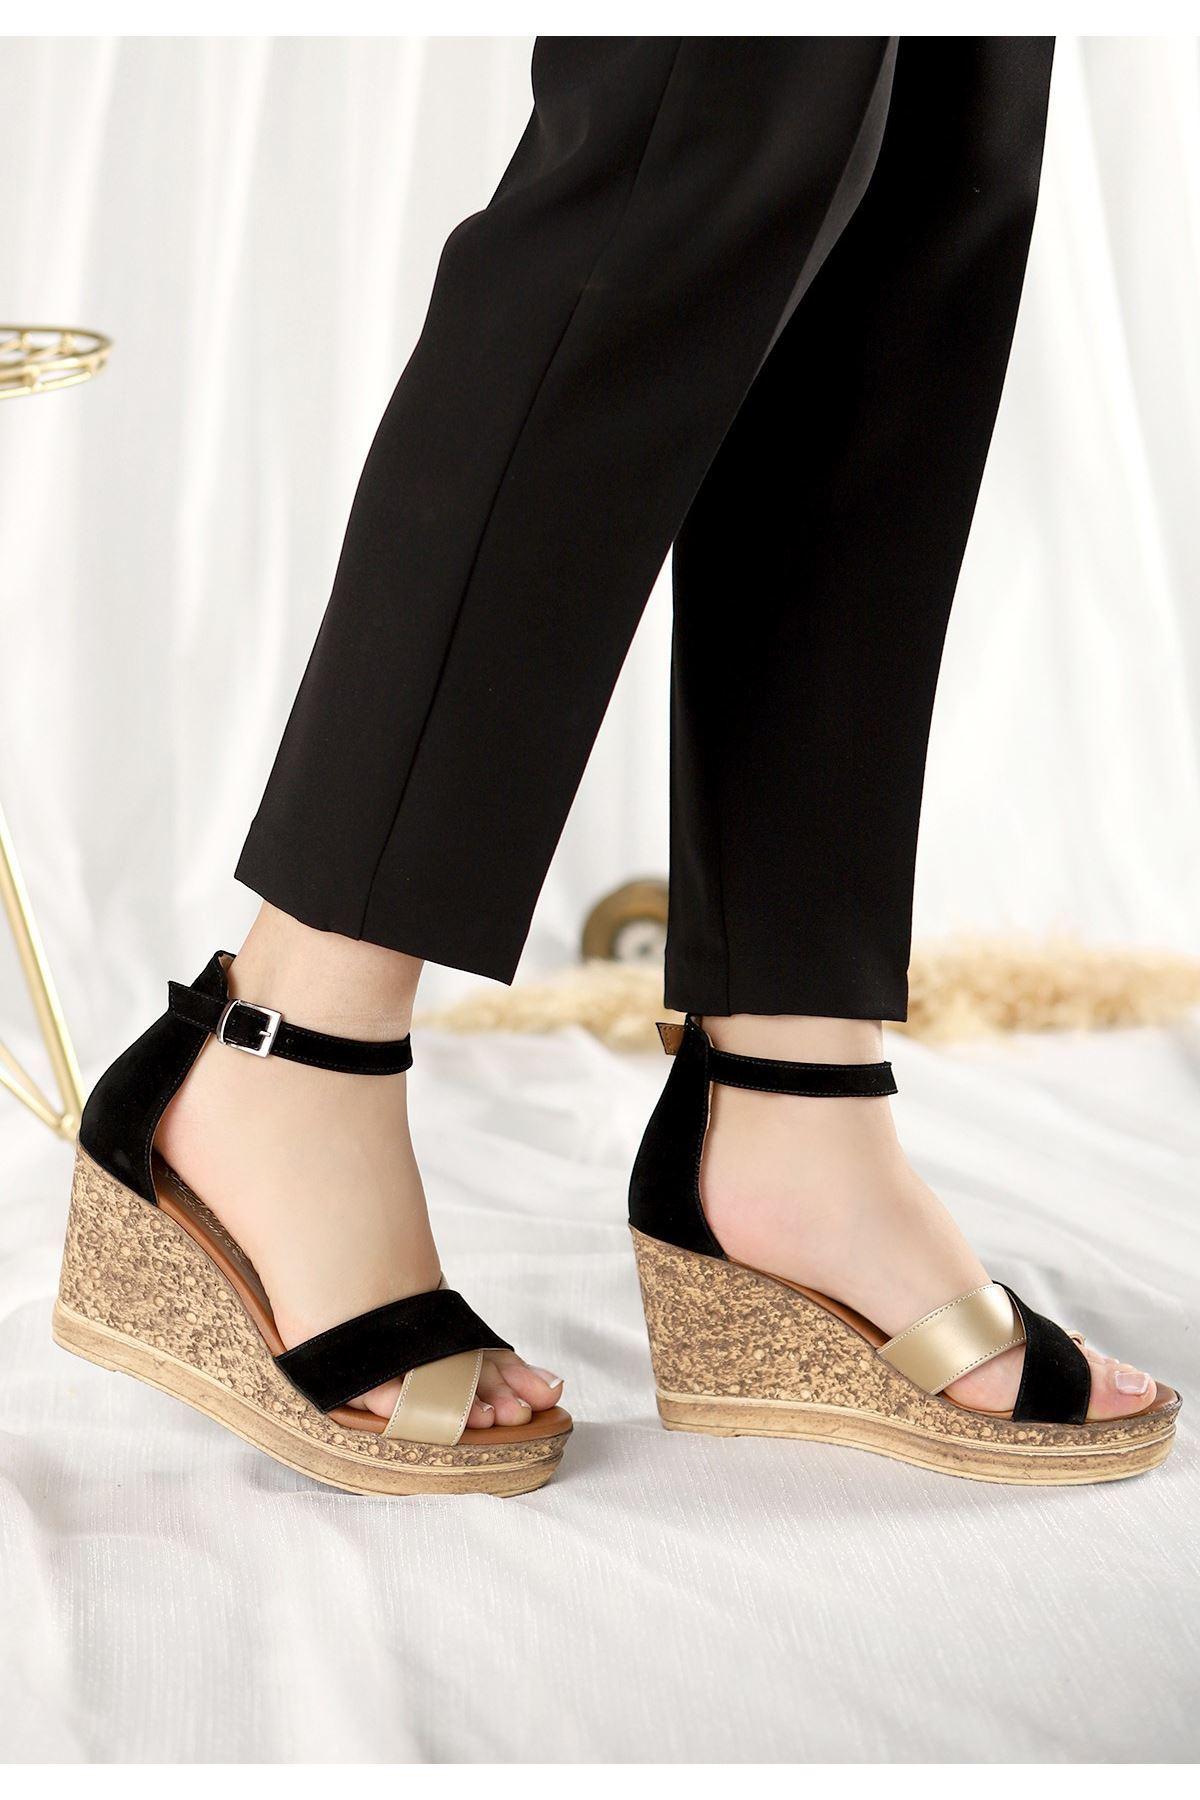 Petro Siyah Süet Gold Detaylı Dolgu Topuk Sandalet